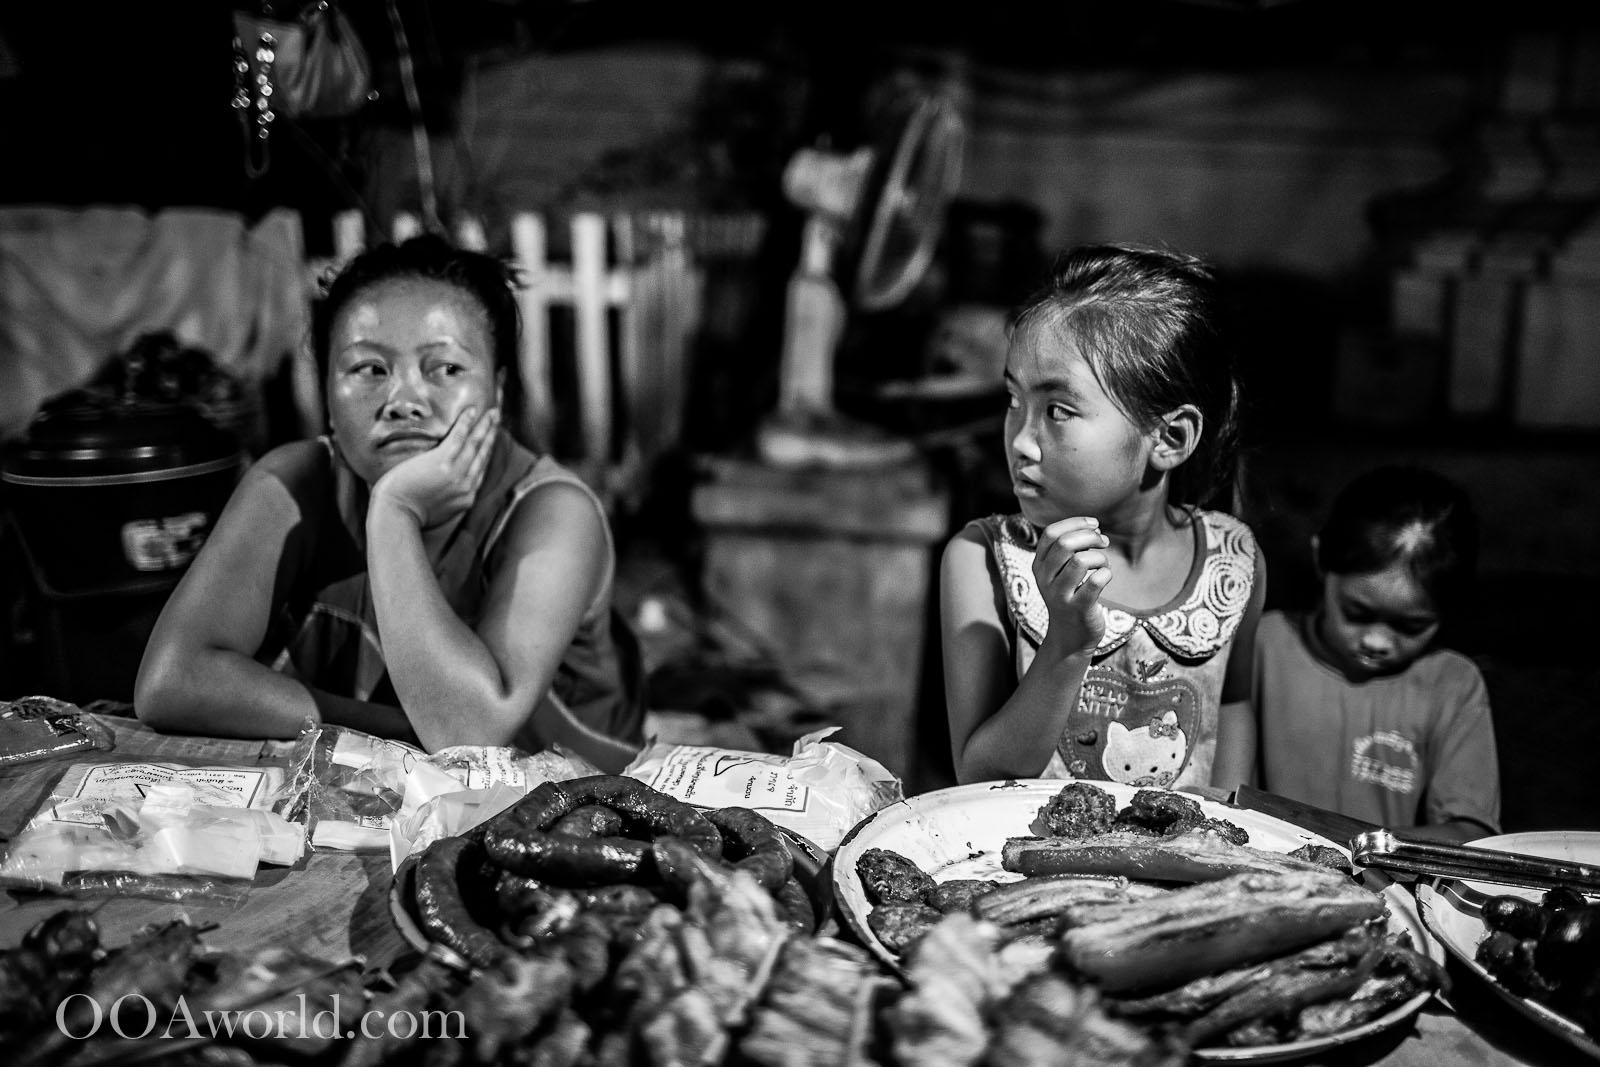 Luang Prabang Night Food Market Laos Photo Ooaworld